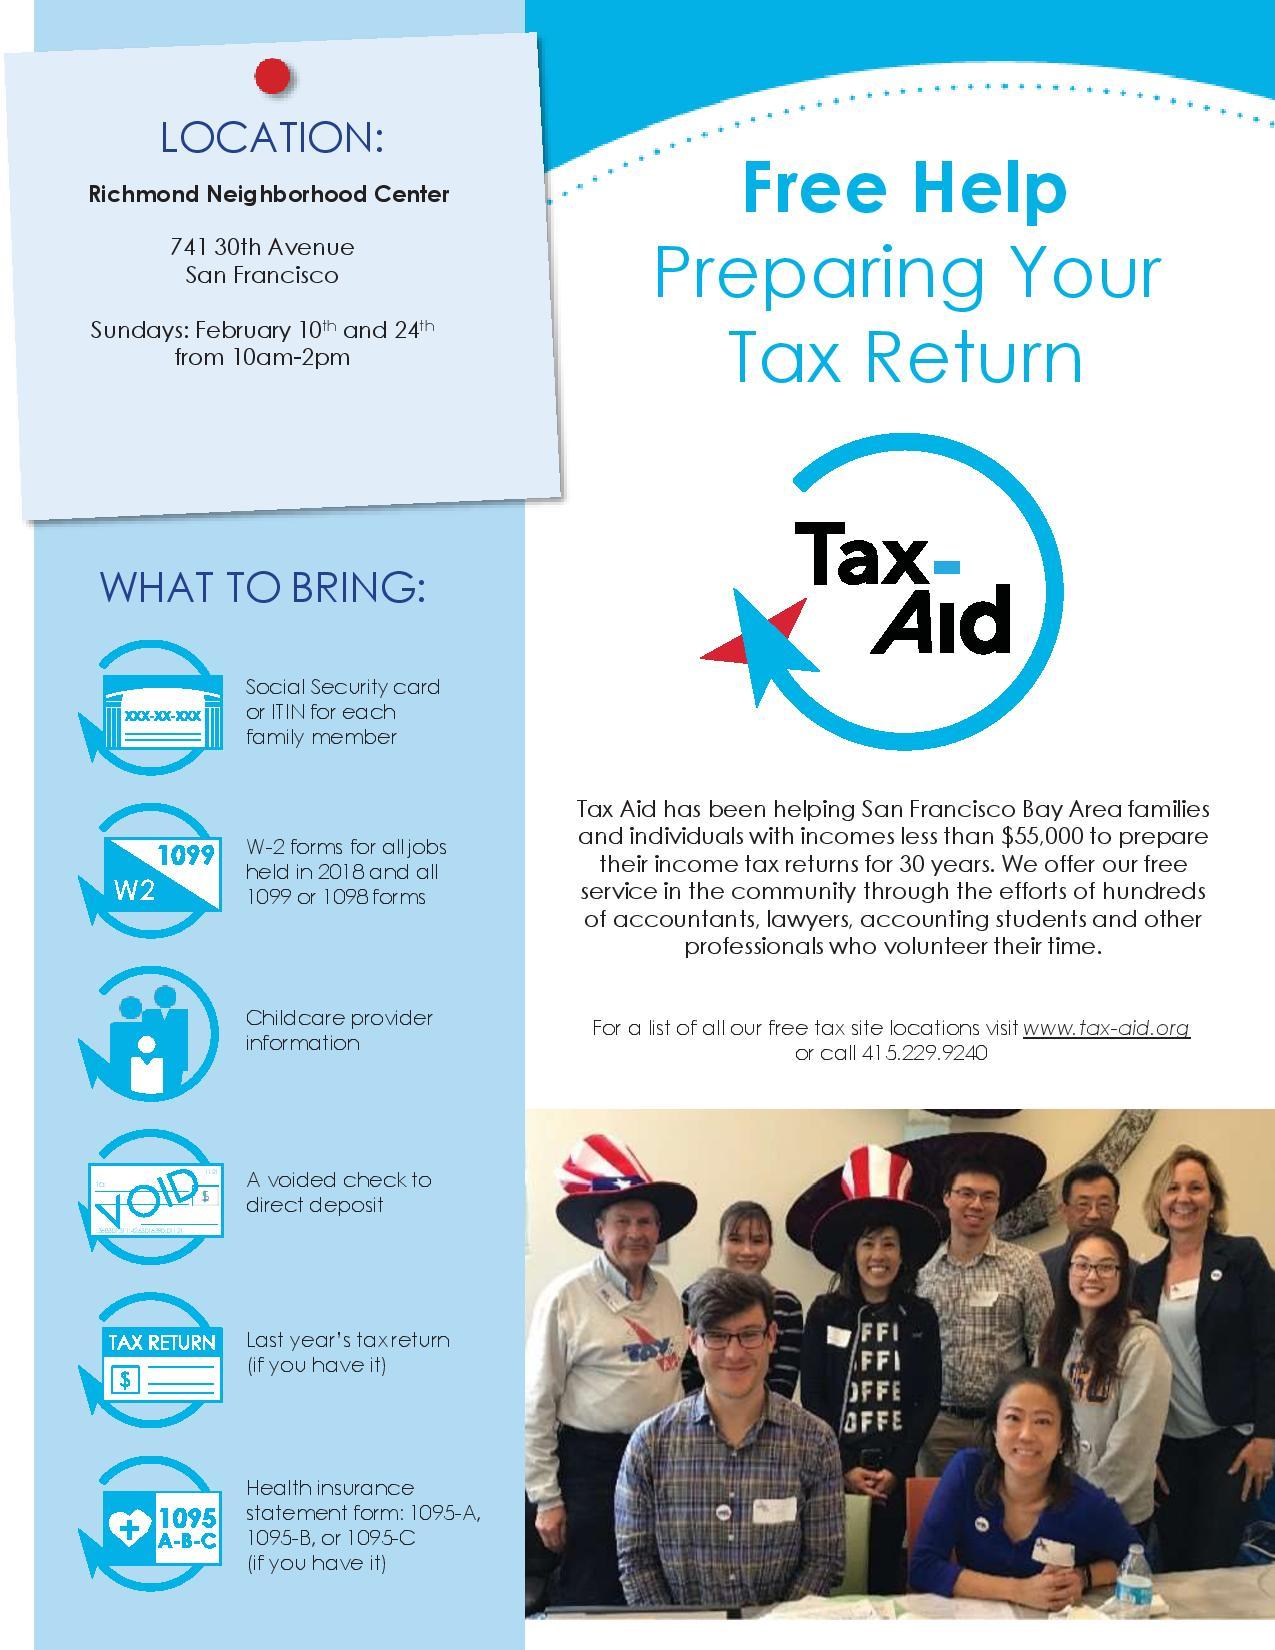 Tax-Aid_Single Site Flyer - Richmond Neighborhood Center-page-001.jpg